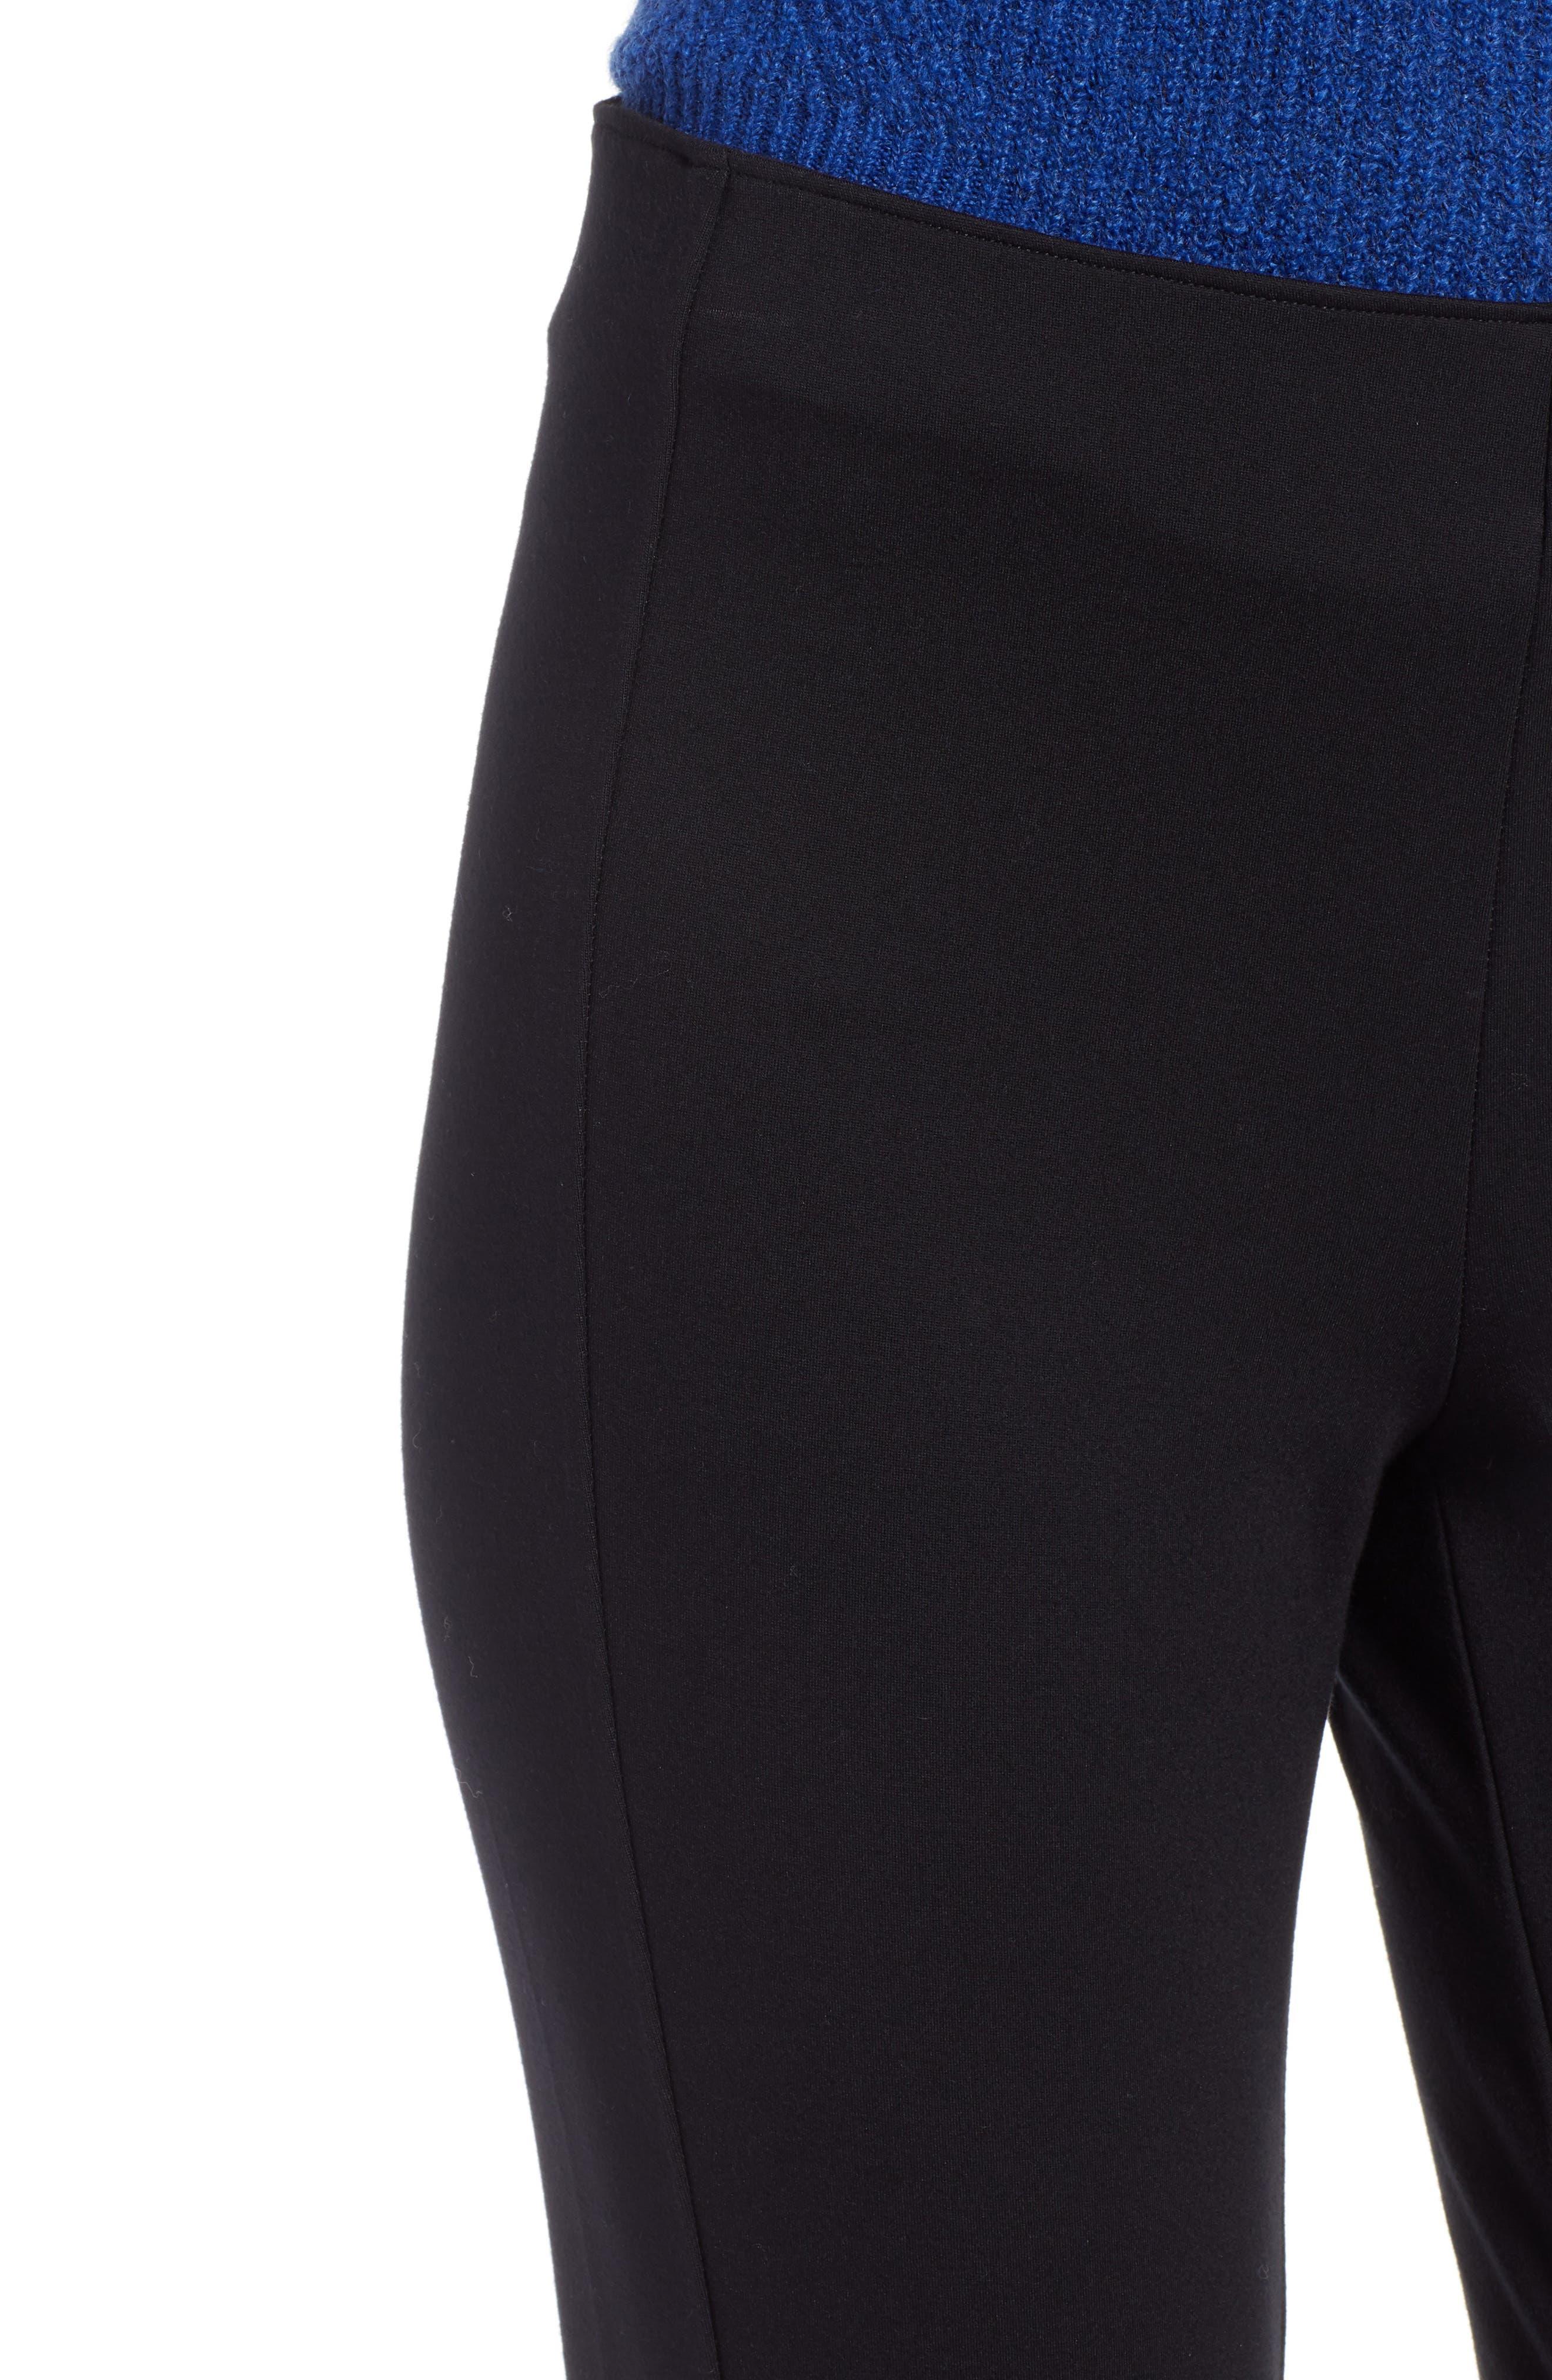 Skinny Ponte Knit Pants,                             Alternate thumbnail 4, color,                             001